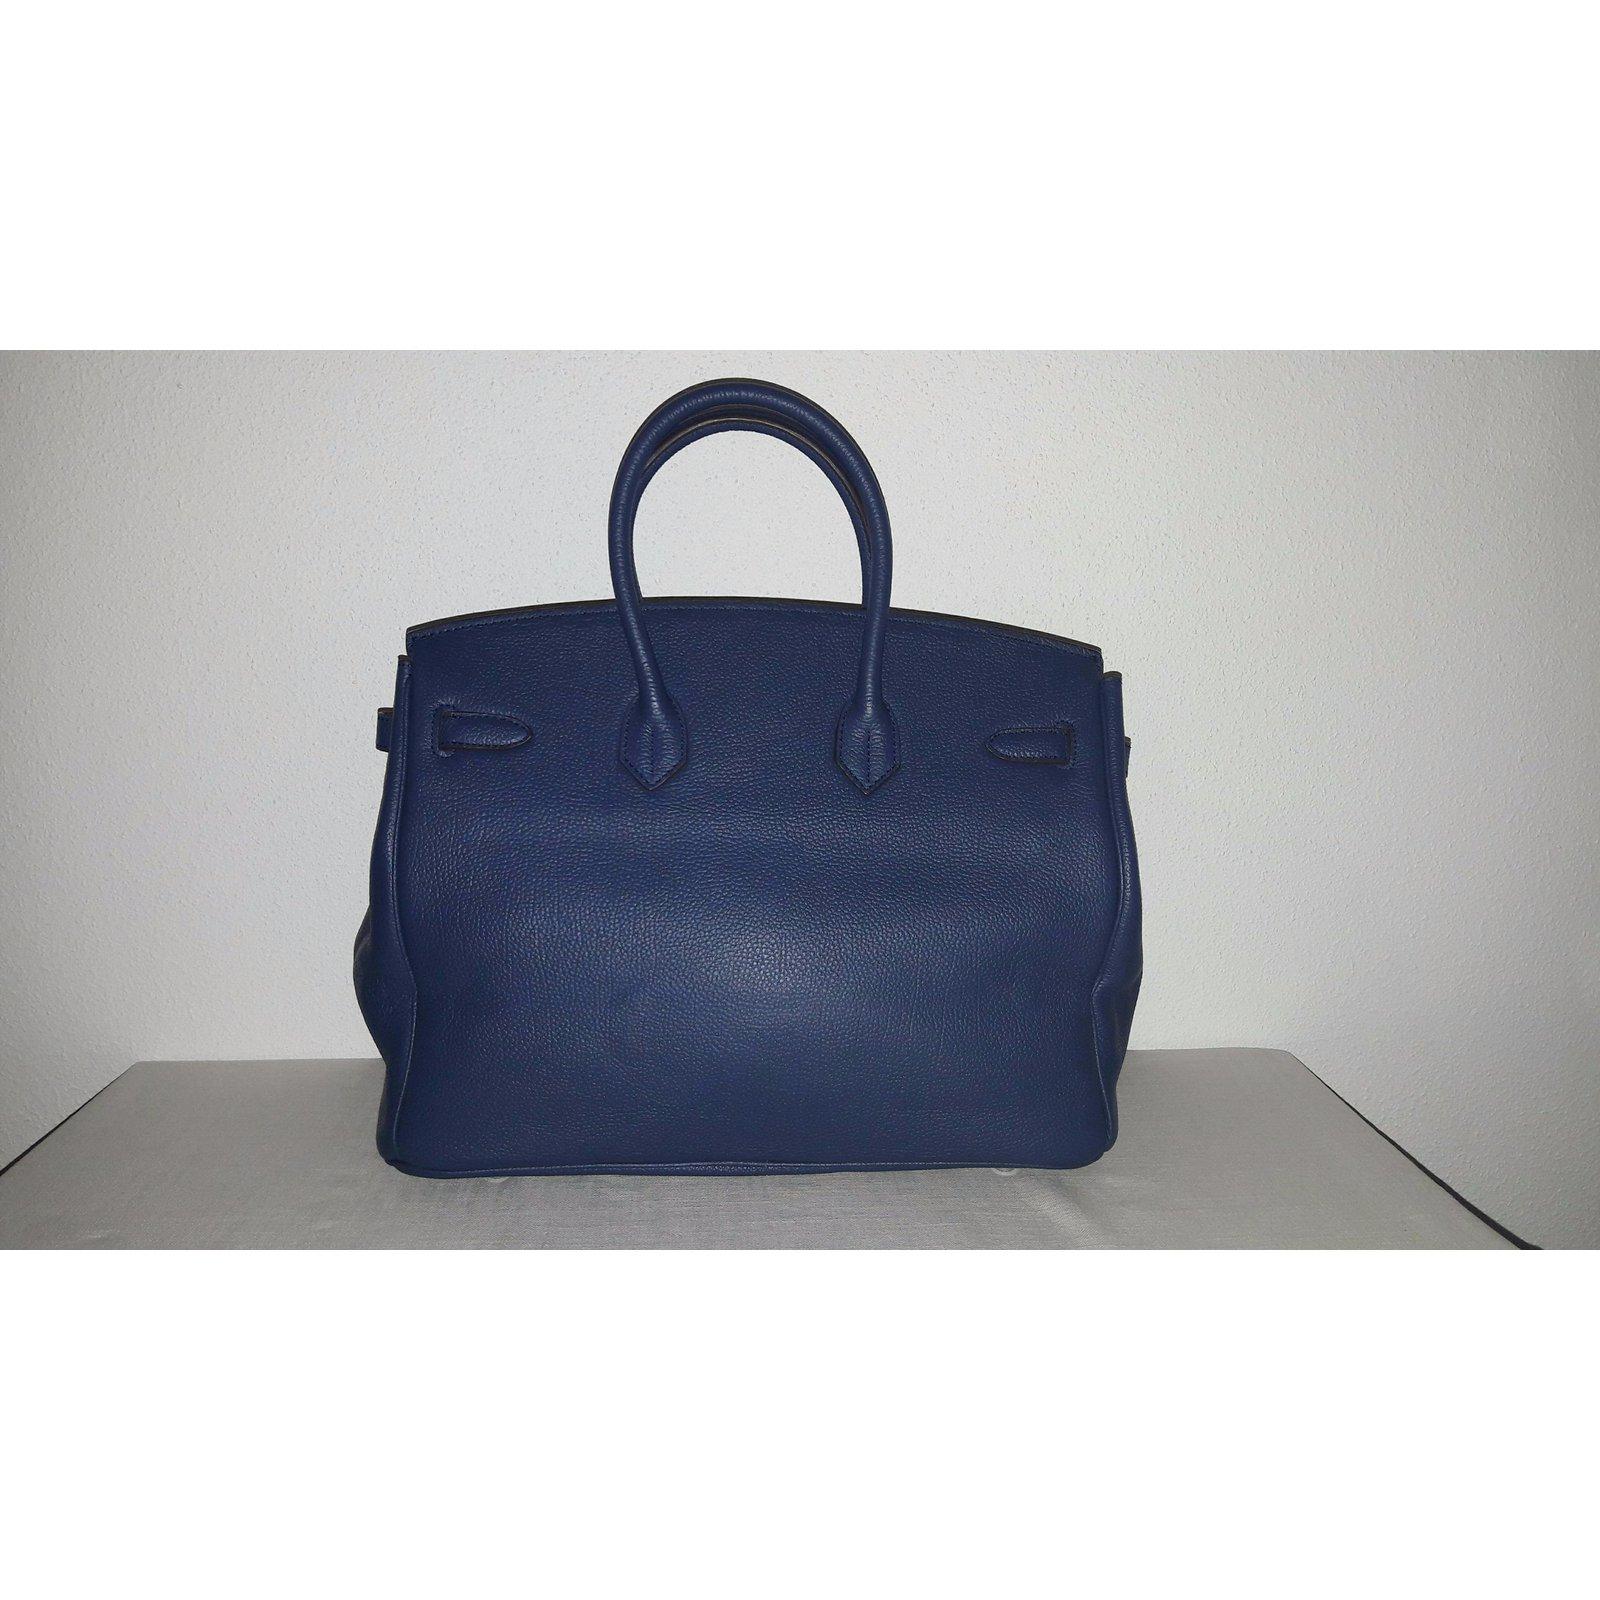 aba0560194 Hermès BIRKIN BLEU 35 Handbags Leather Navy blue ref.54322 - Joli Closet